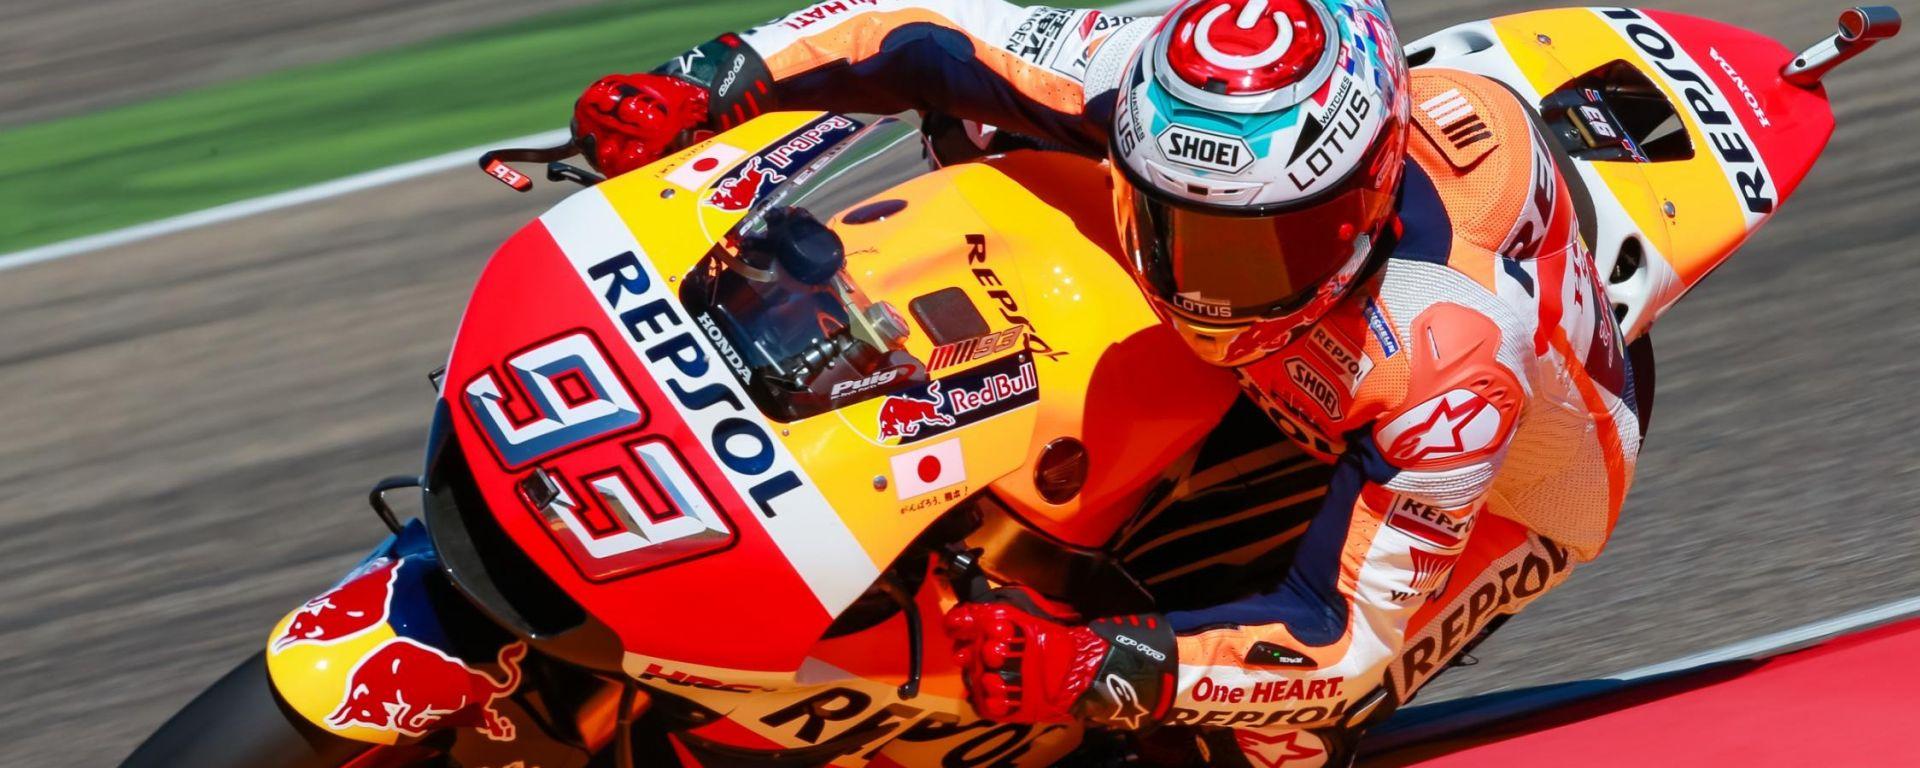 MotoGP Aragon 2017, Marc Marquez